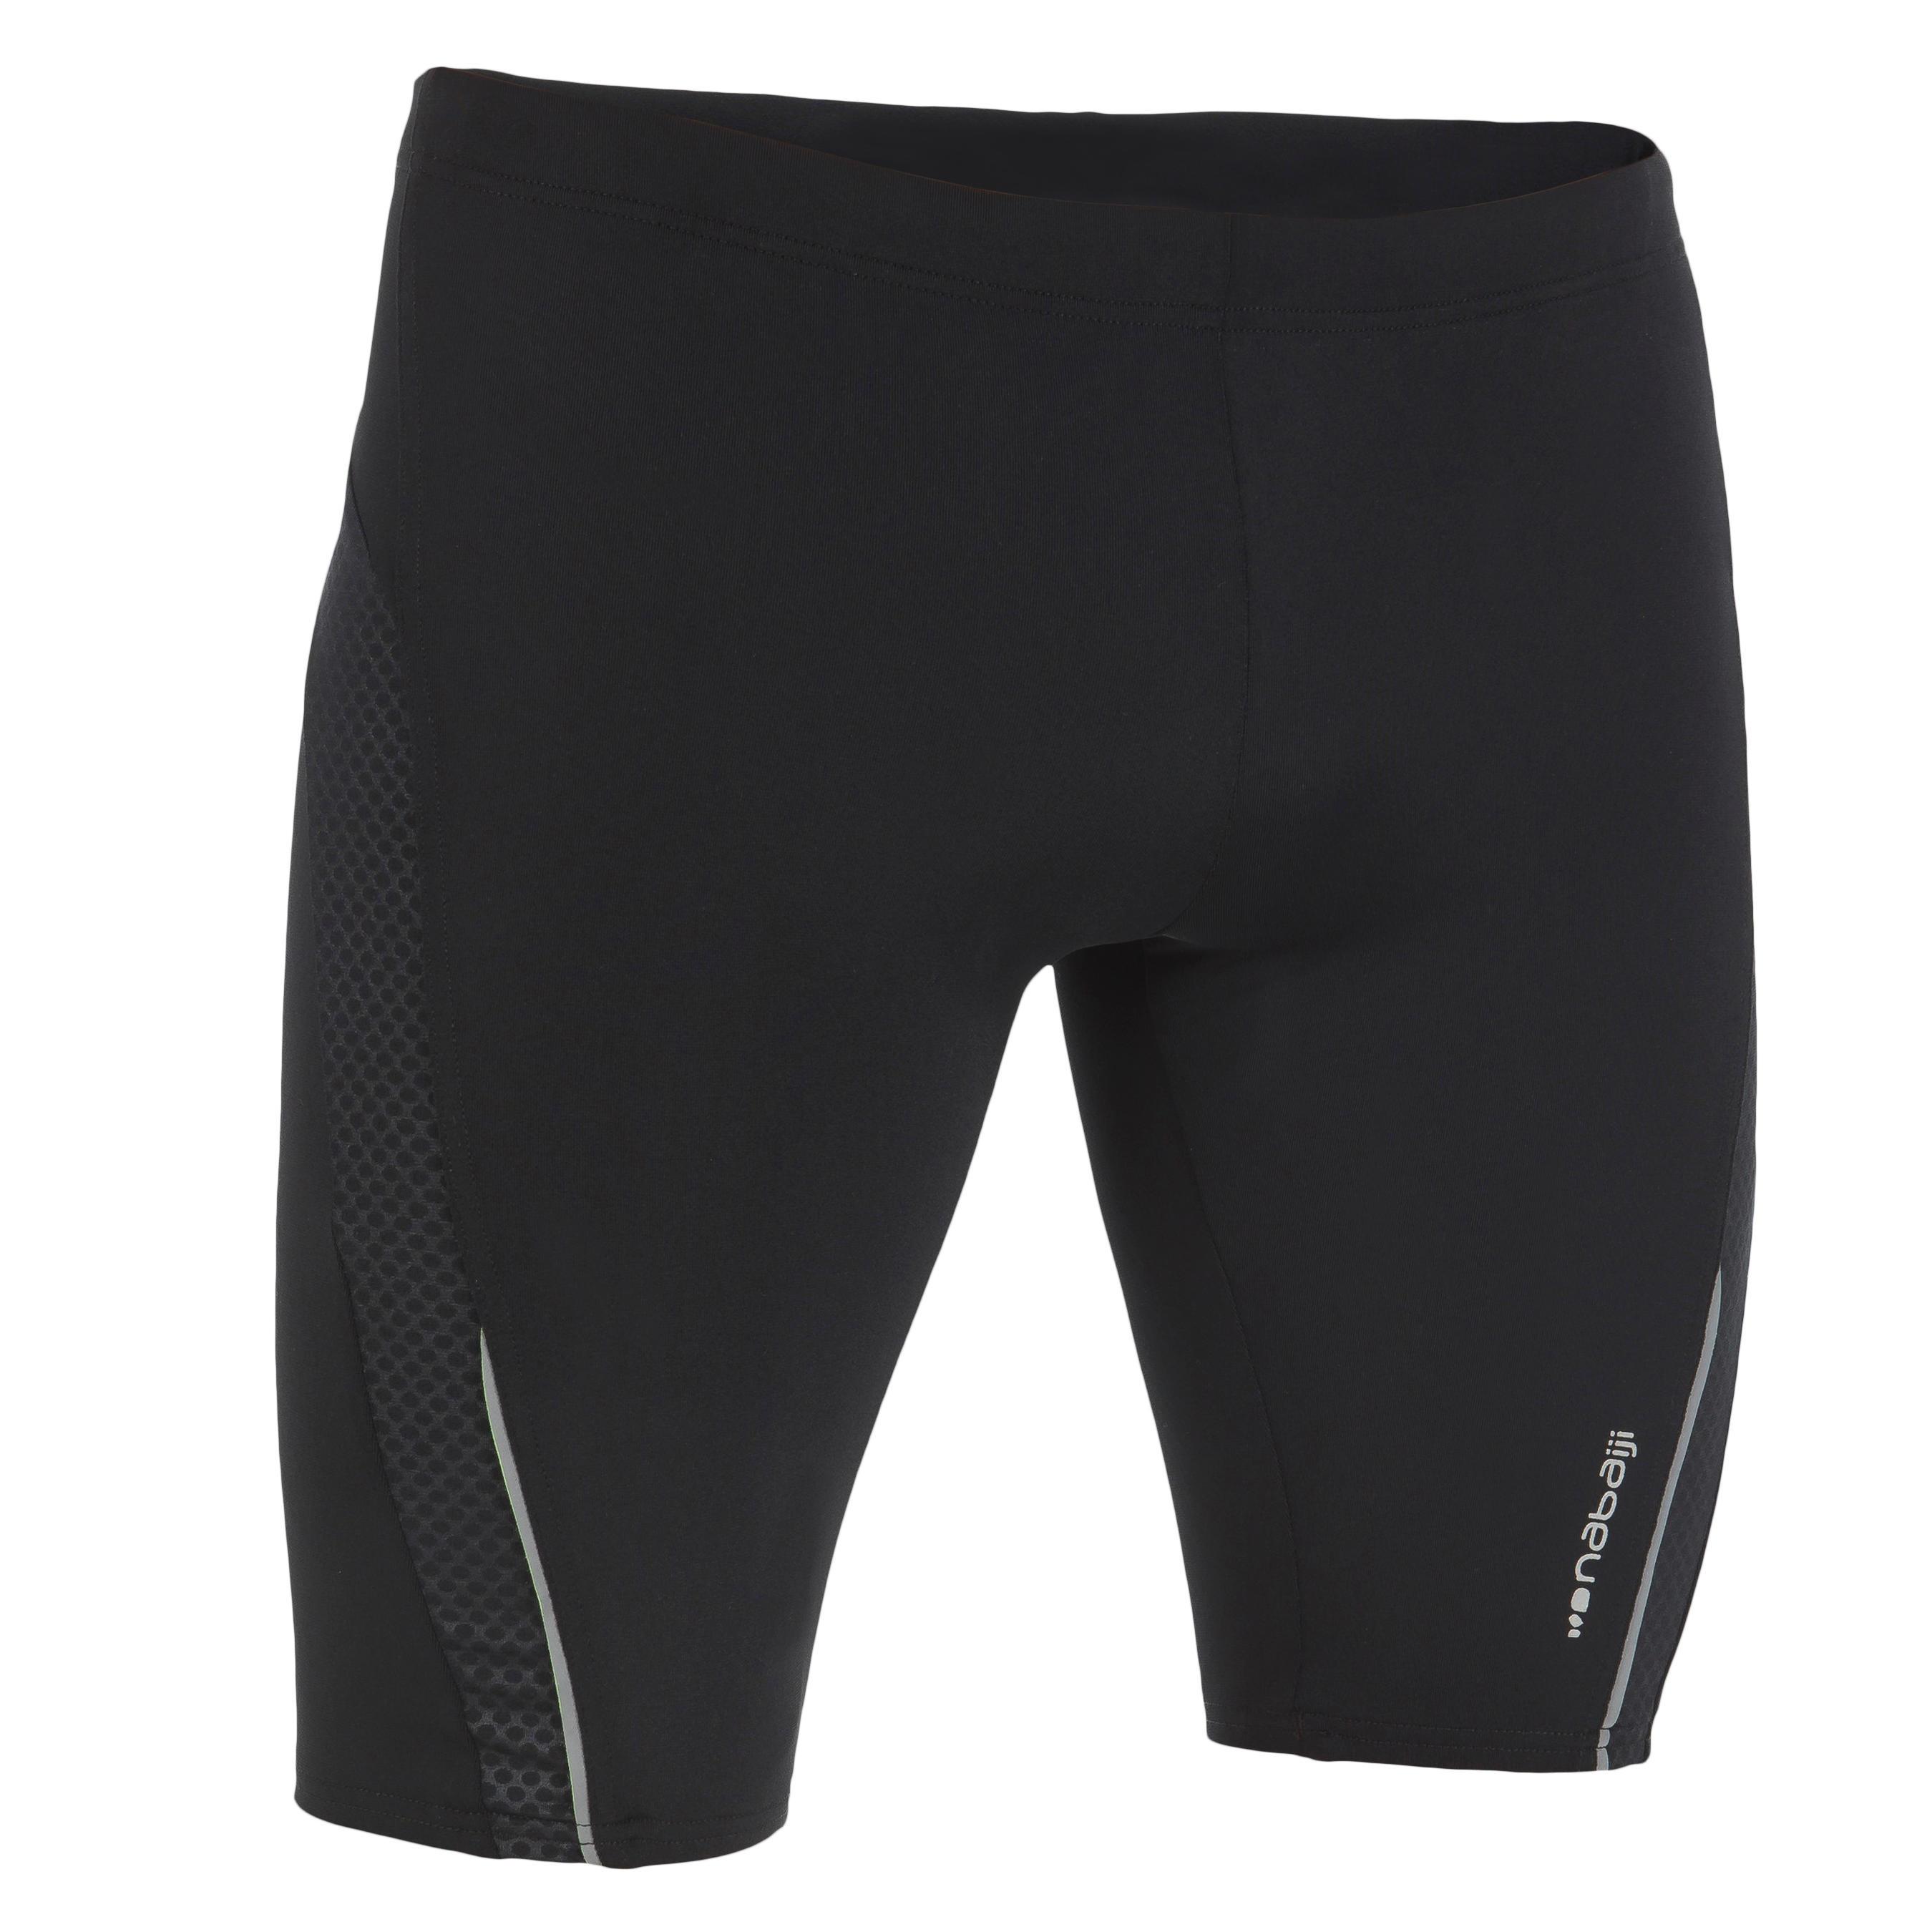 B-First Men's Jammer Swim Shorts - Black Dot